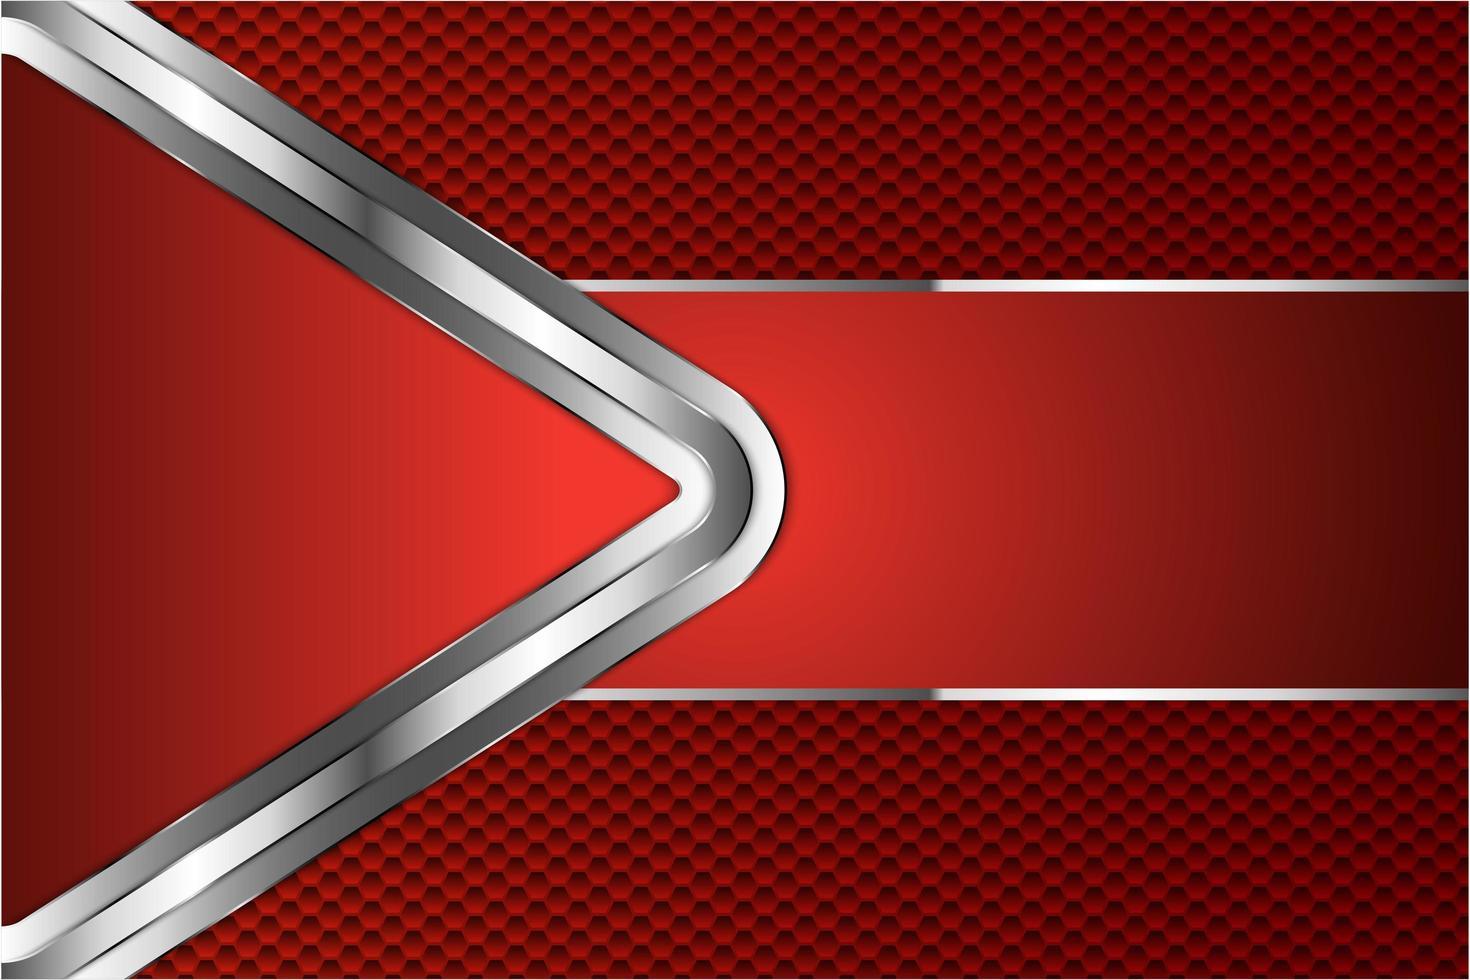 röd metall bakgrund med sexkant vektor